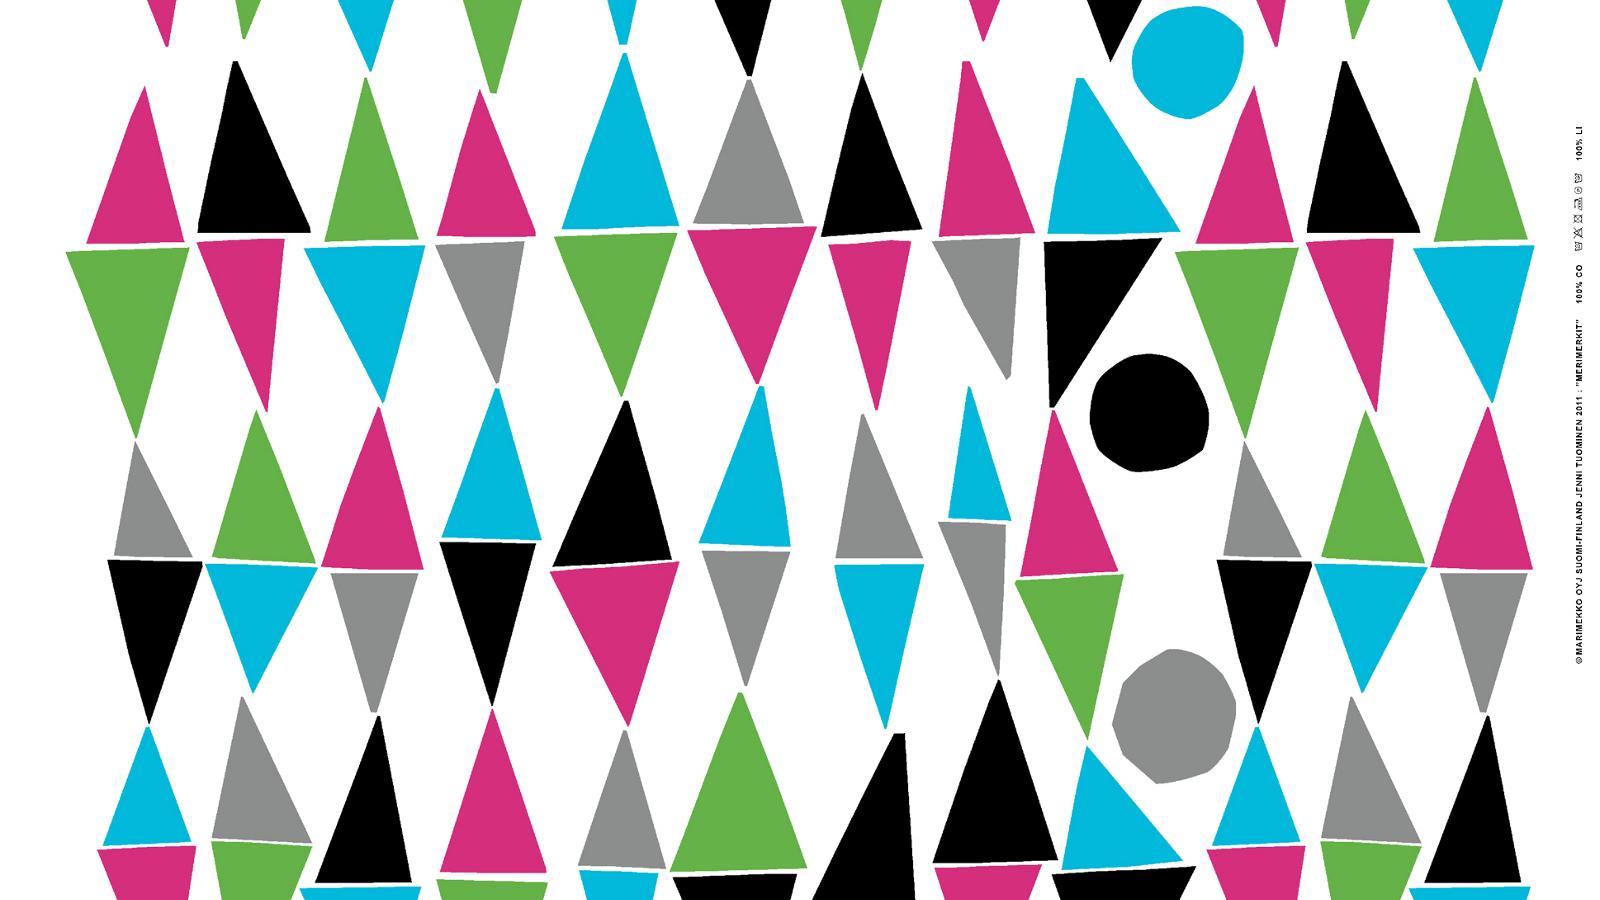 Free Download Wallpapers Marimekko Iphone 6 And Iphone Wallpapers